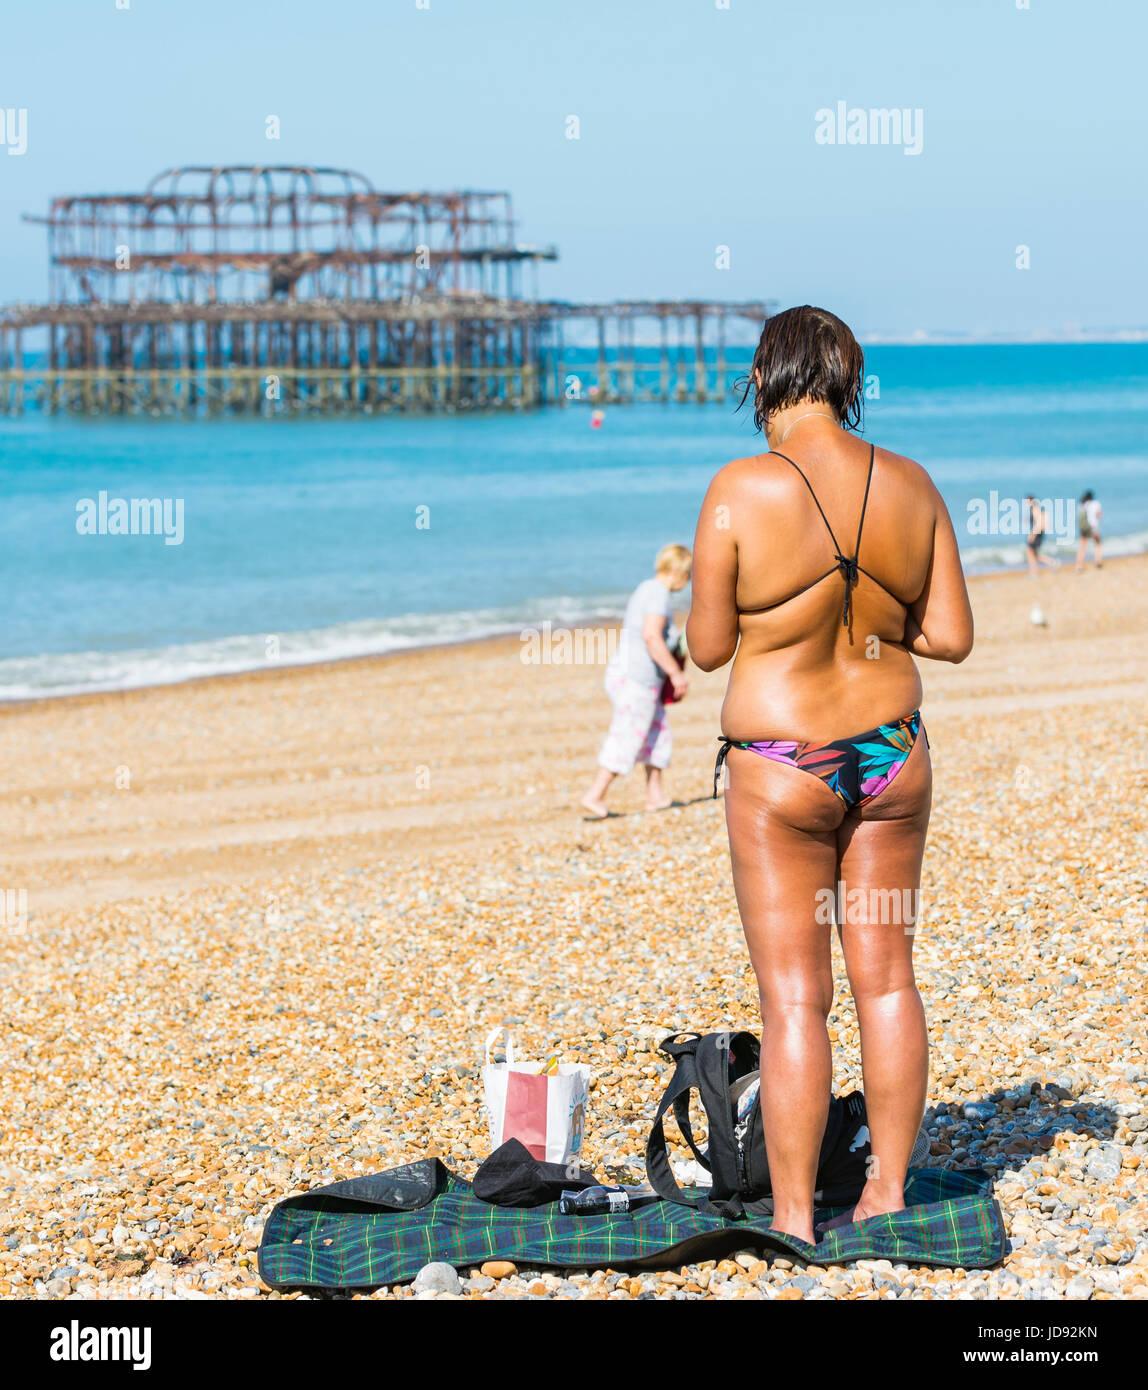 Sommer-Konzept. Stark gebräunt Frau im Bikini stehen am Strand an einem heißen Sommertag in Brighton, Stockbild